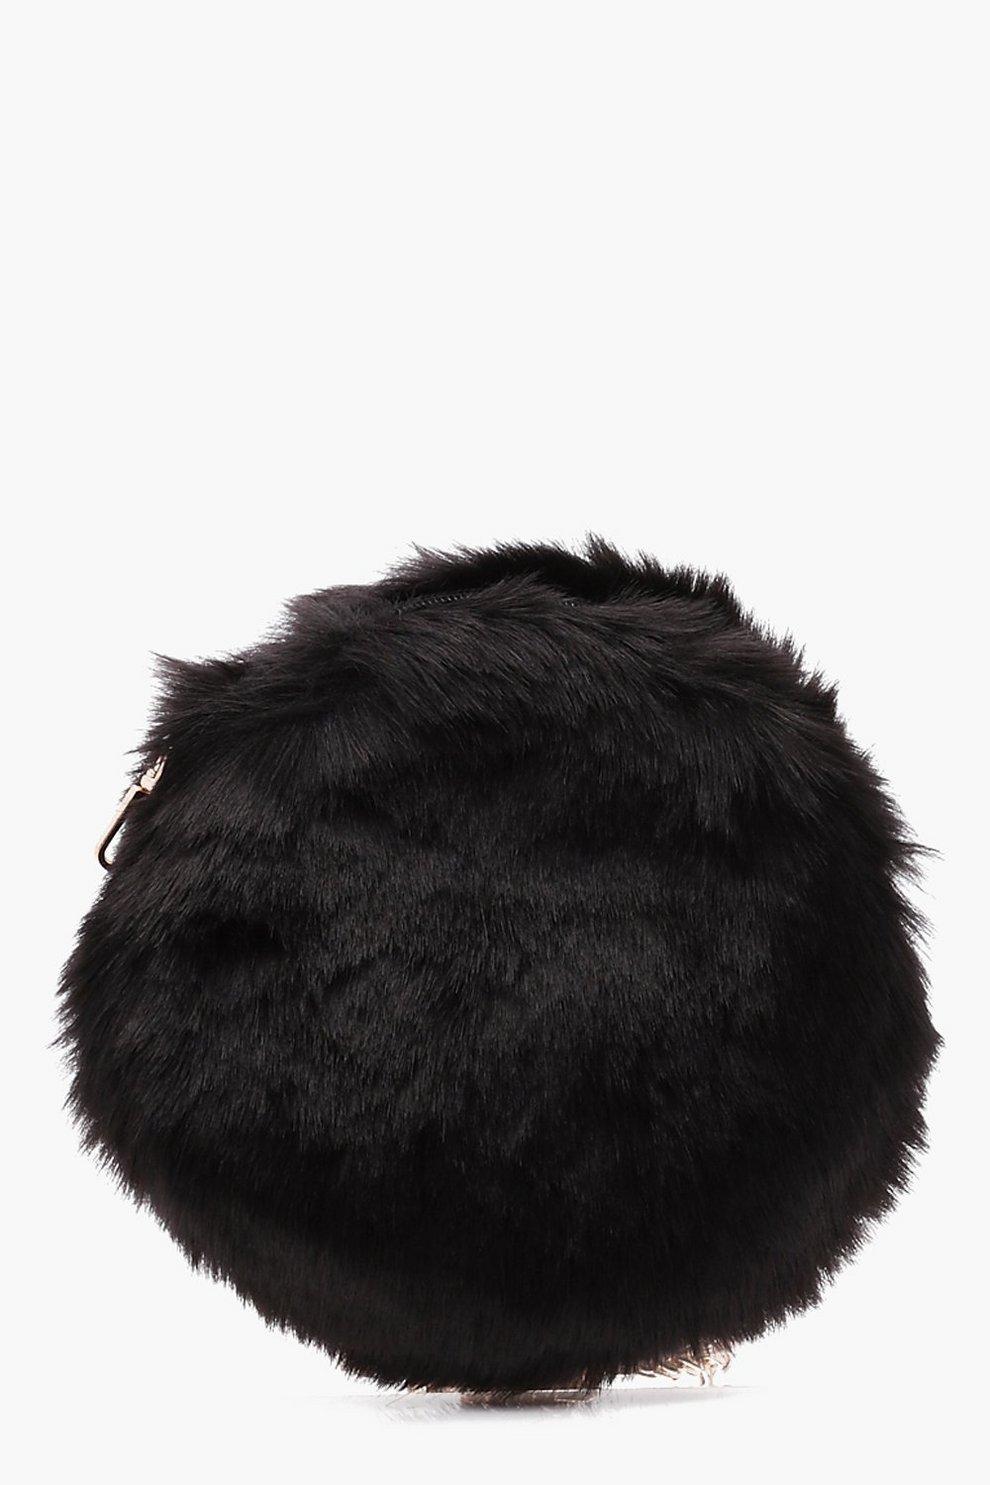 Bec Round Faux Fur Cross Body Bag  b4ca81735ecab